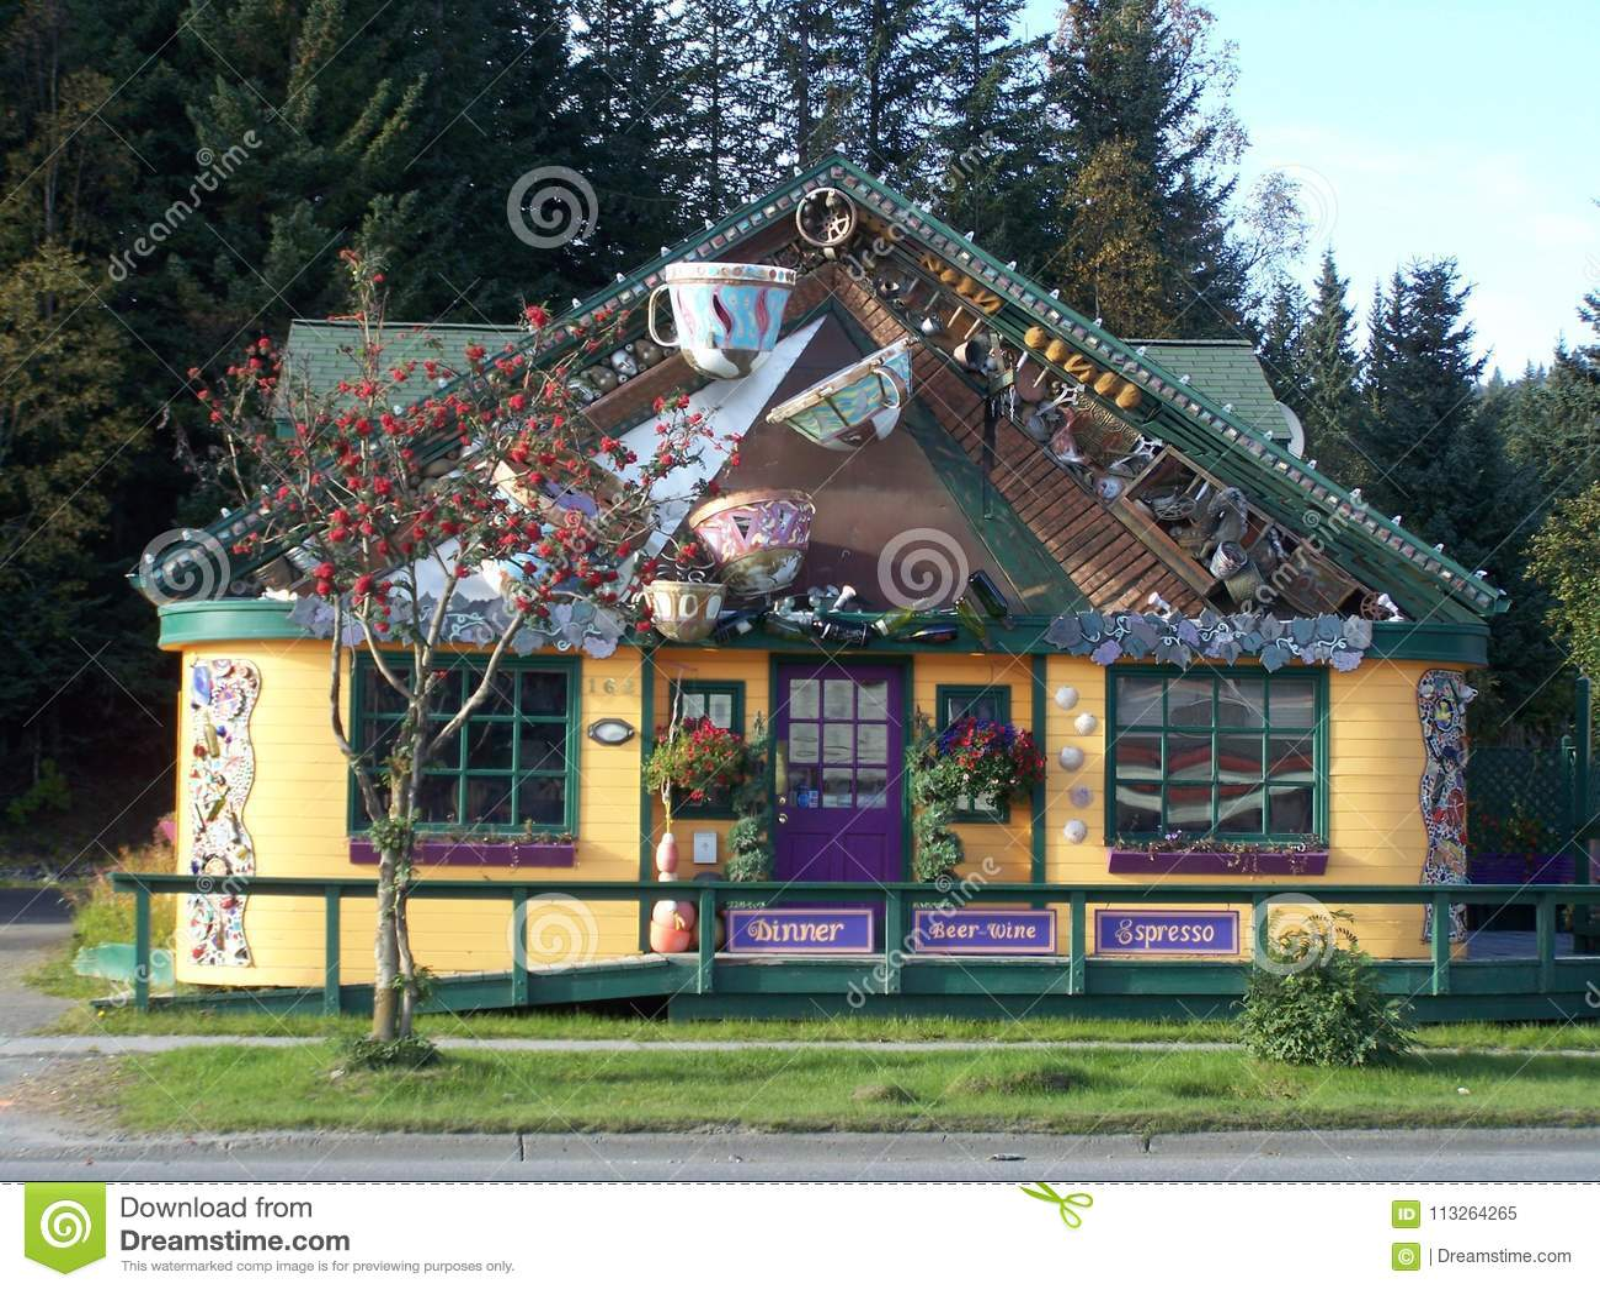 Cafe Cups Restaurant In Homer Alaska Editorial Image - Image